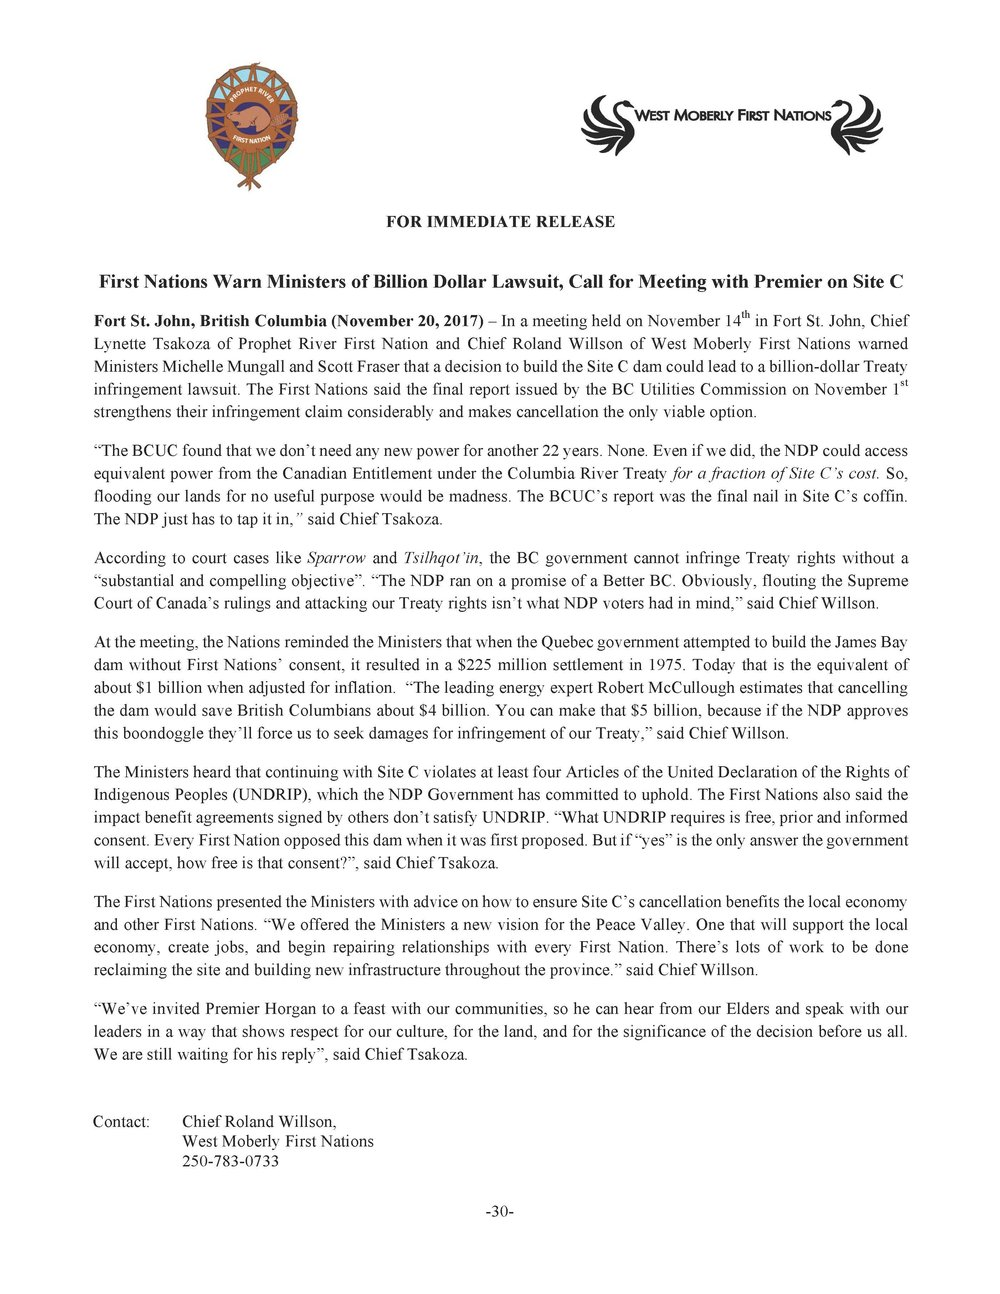 2017-11-20 Press Release (RE Billion Dollar Lawsuit Mtg with BC Premier)-image.jpg